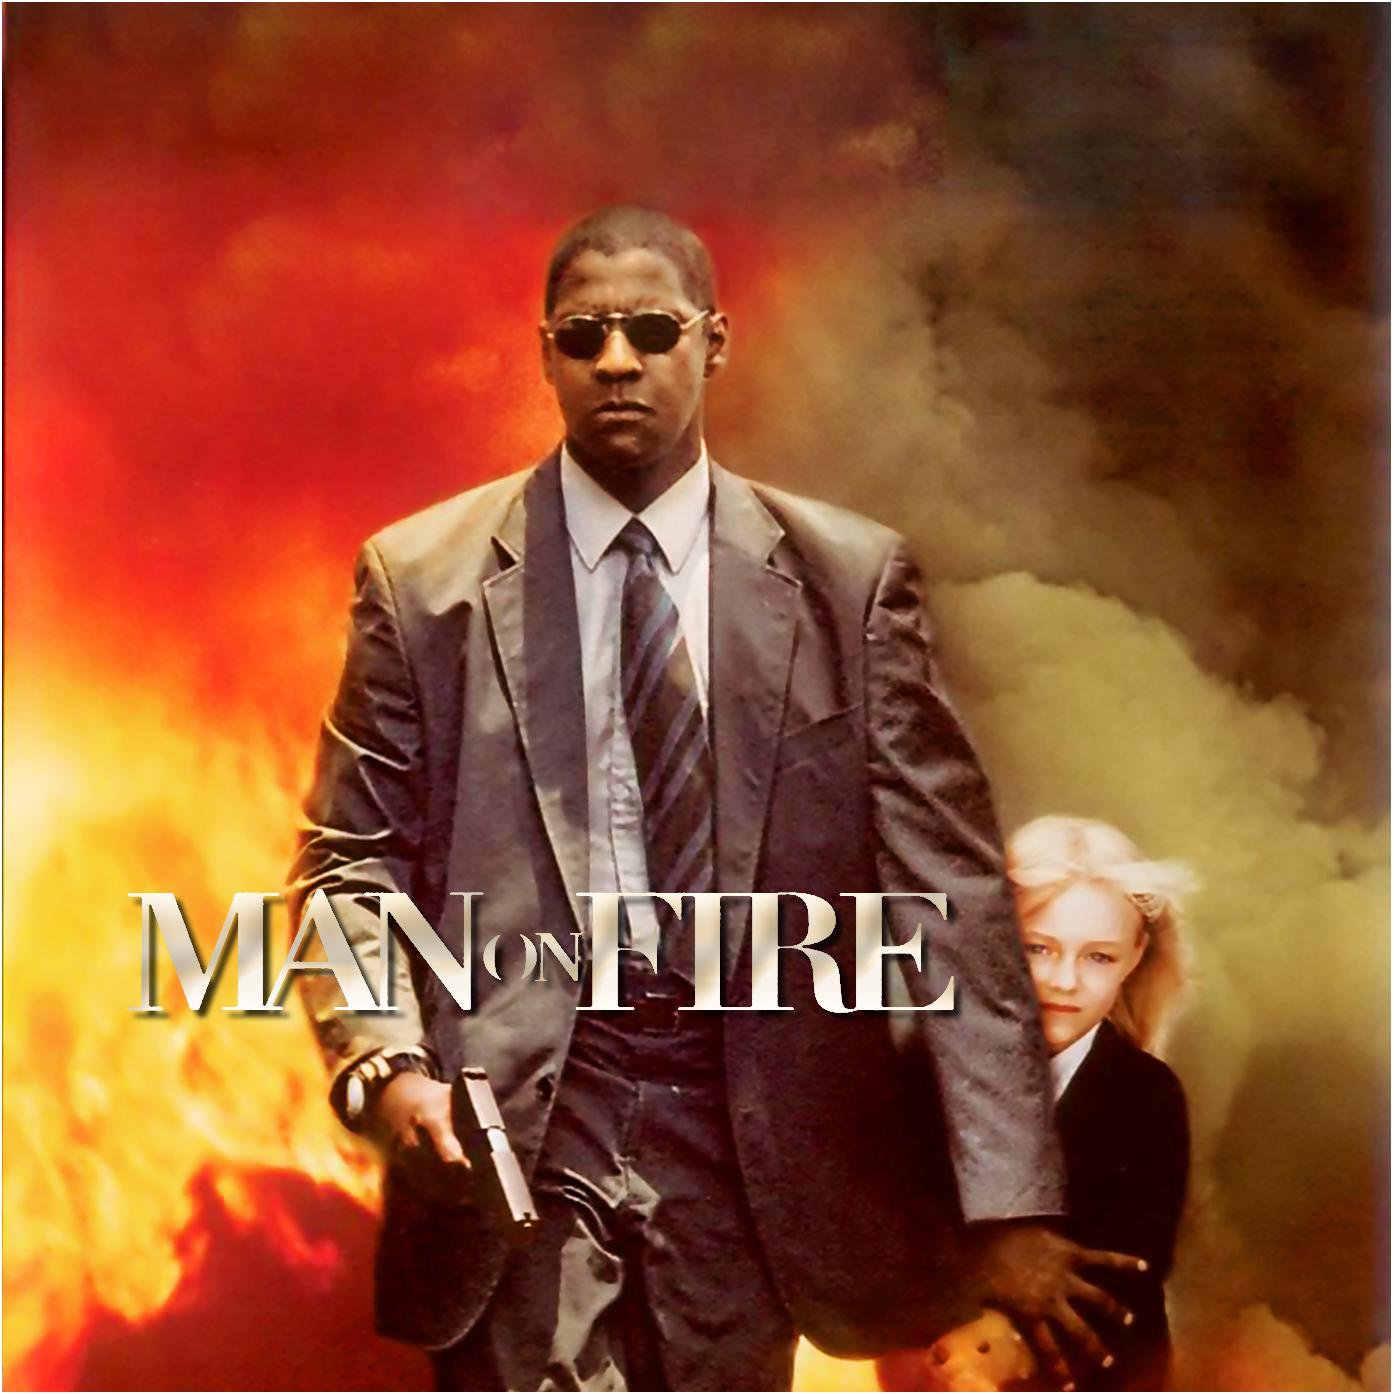 man-on-fire-2004.jpg